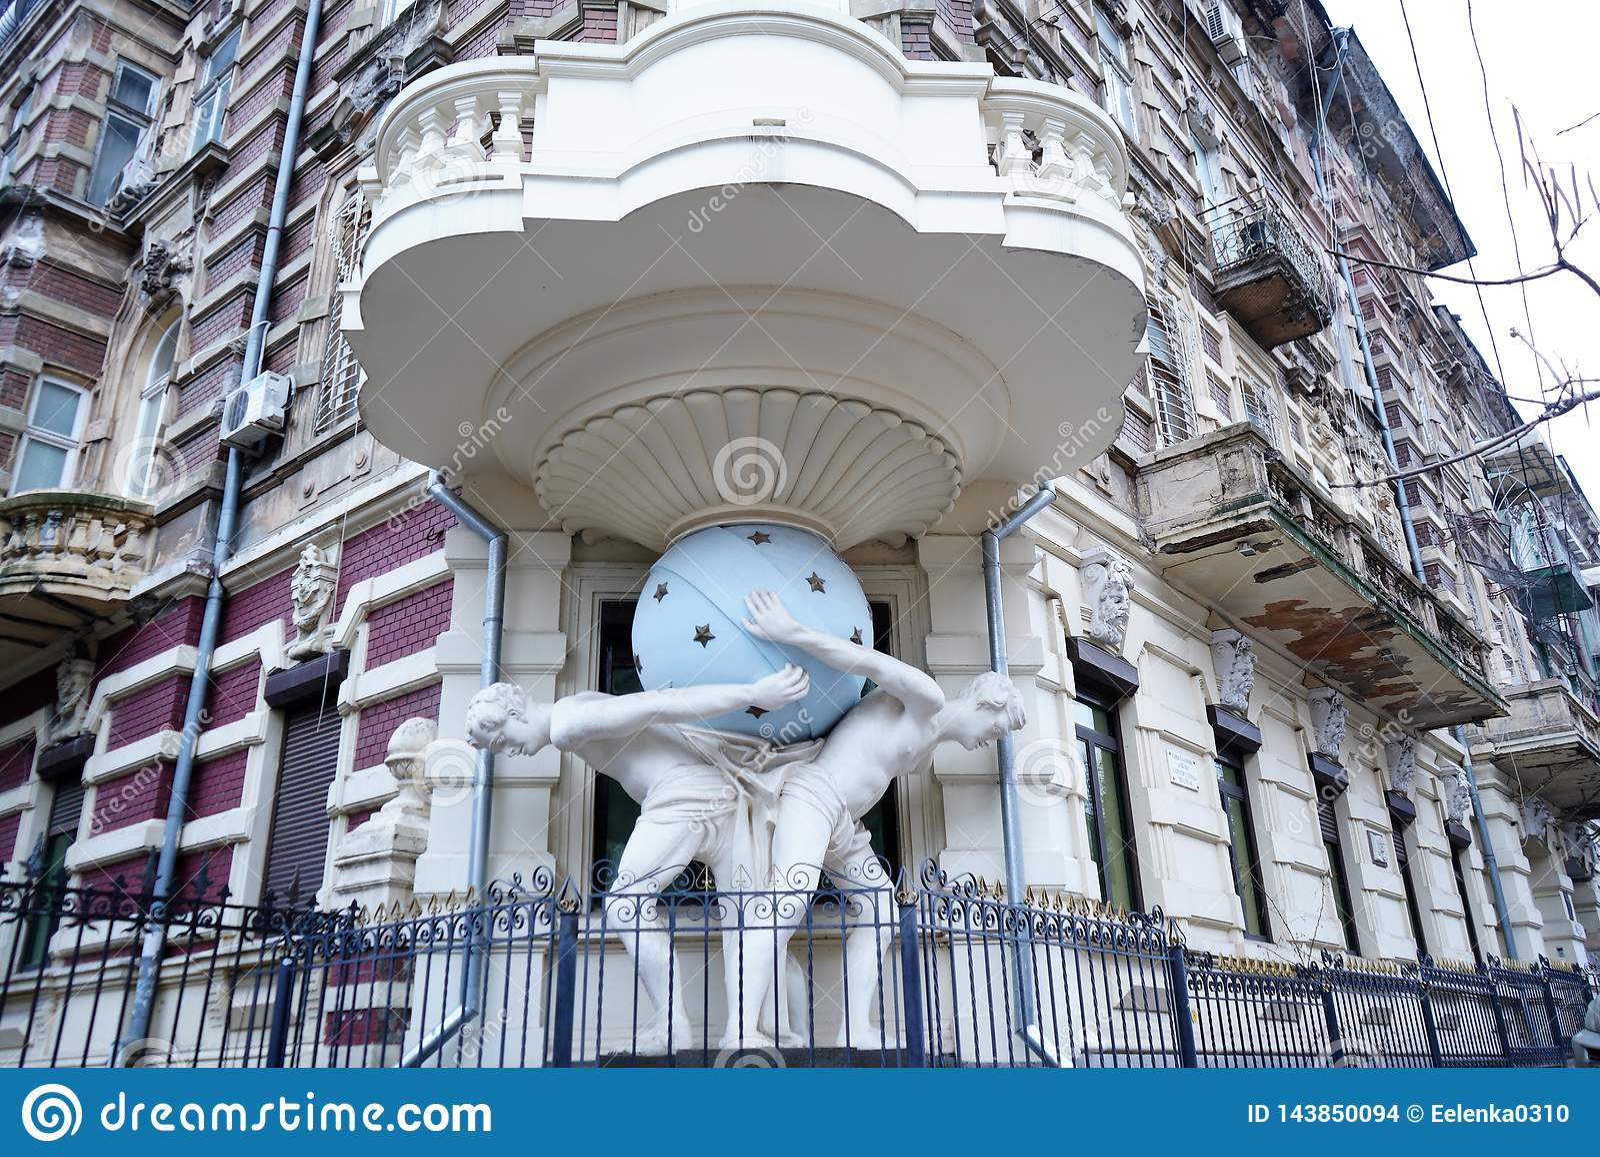 Casa con Atlantes en Odessa Ukraine Balc?n de la esquina favorable del monumento En 1899 a?o construido